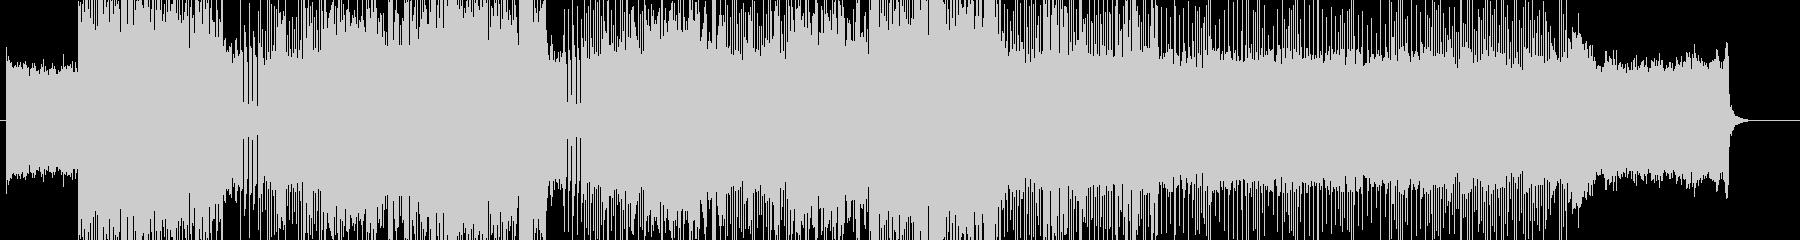 「HR/HM」「DEATH」BGM210の未再生の波形